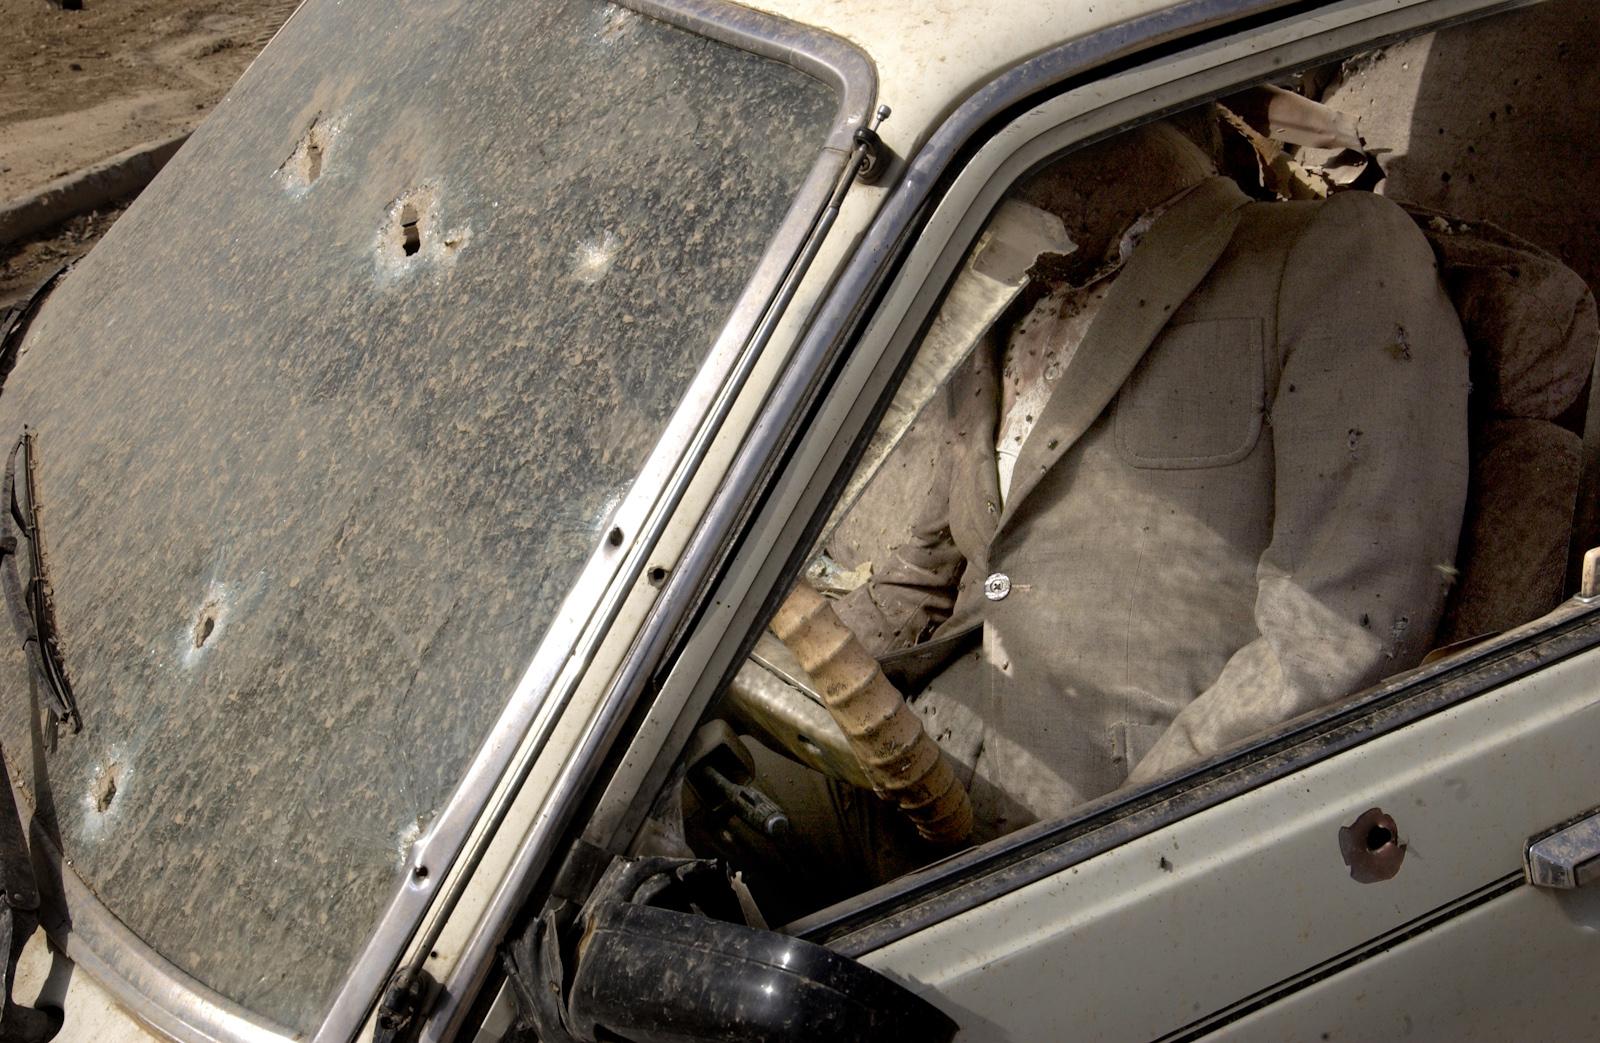 A body of a man killed by a US Army sniper, Baghdad, Iraq. April 10, 2003.